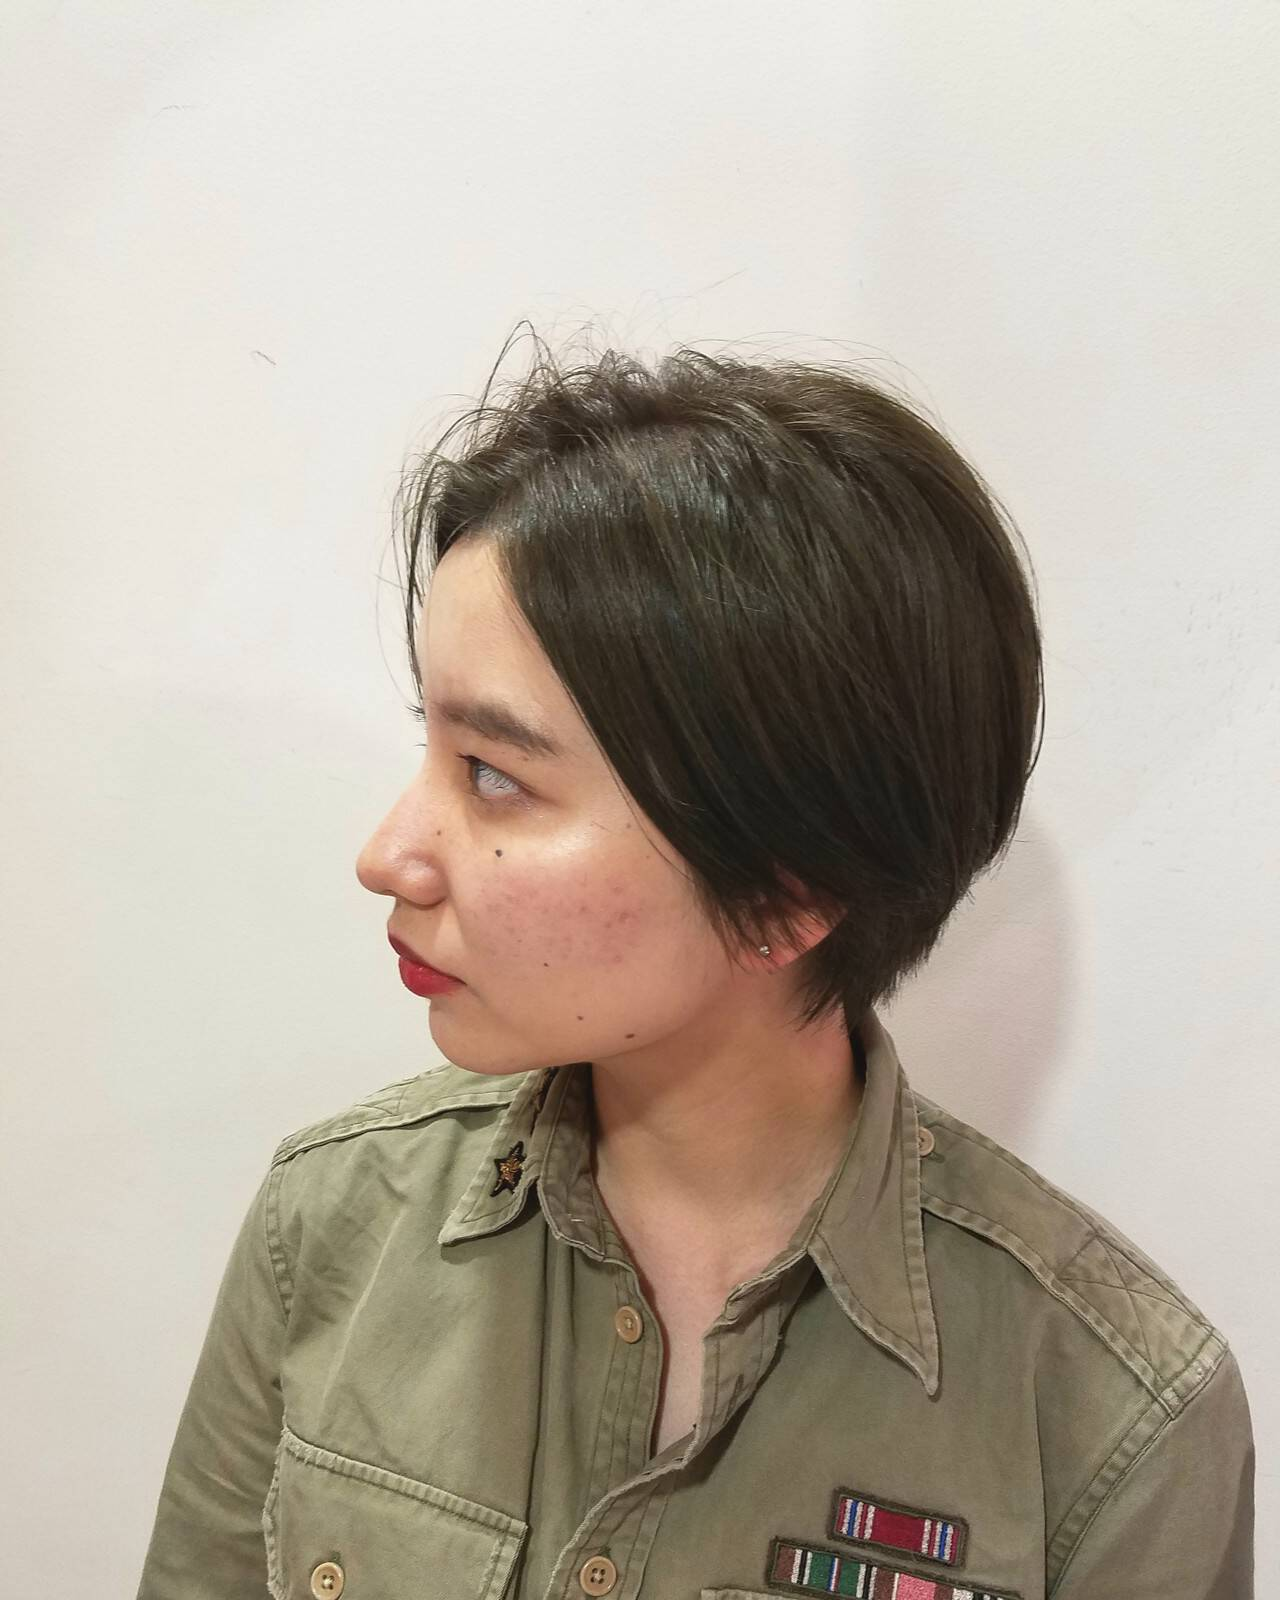 N.オイル ハンサムショート マットグレージュ ショートヘアスタイルや髪型の写真・画像